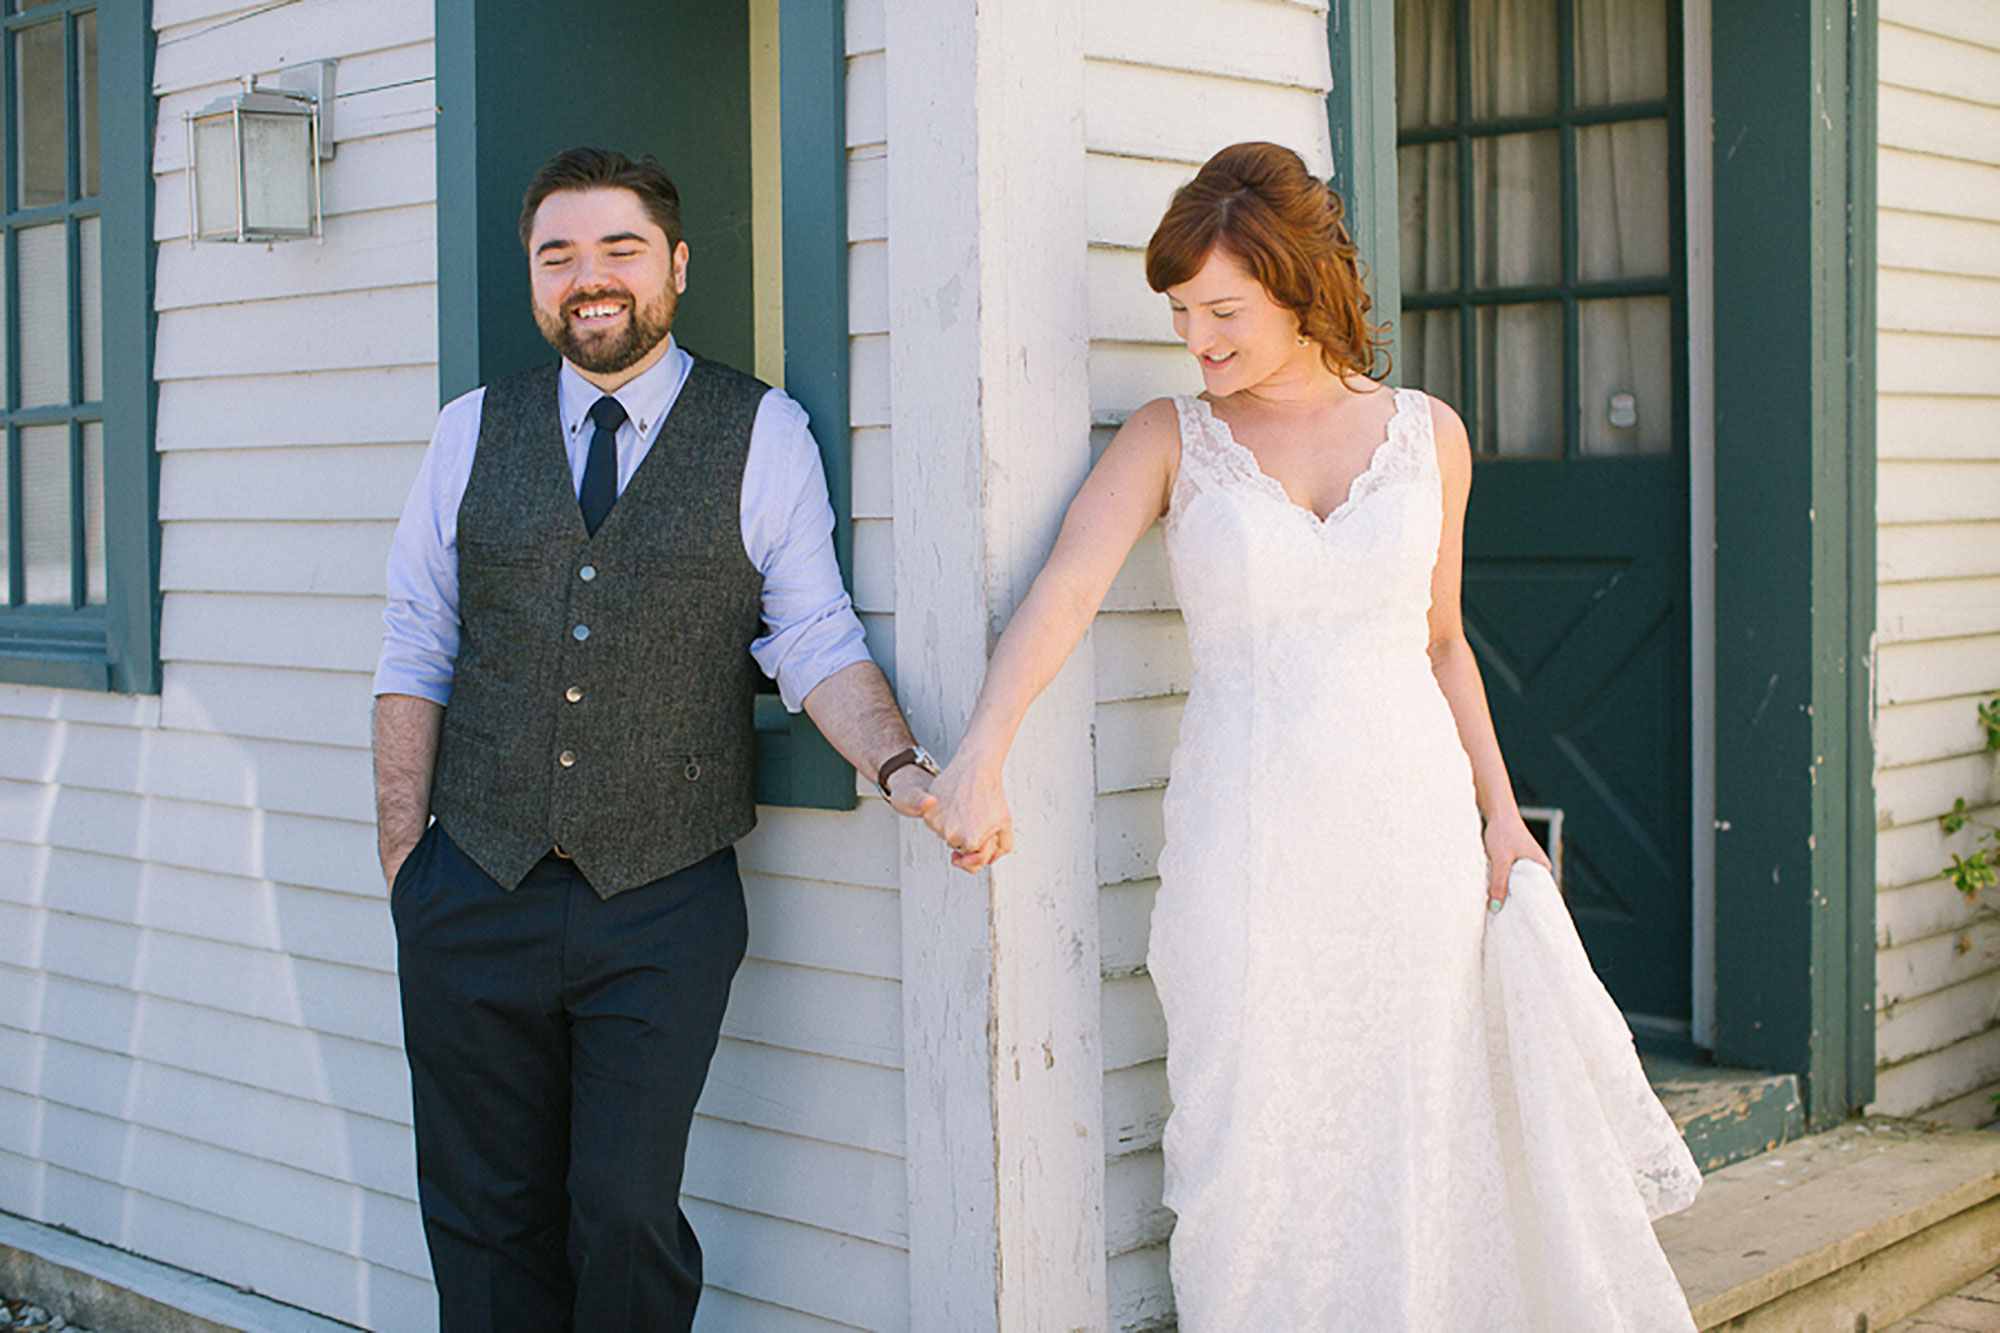 Navy-Hall-Wedding-Vineyard-Bride-Photo-By-Andrew-Mark-Photography-008.jpg